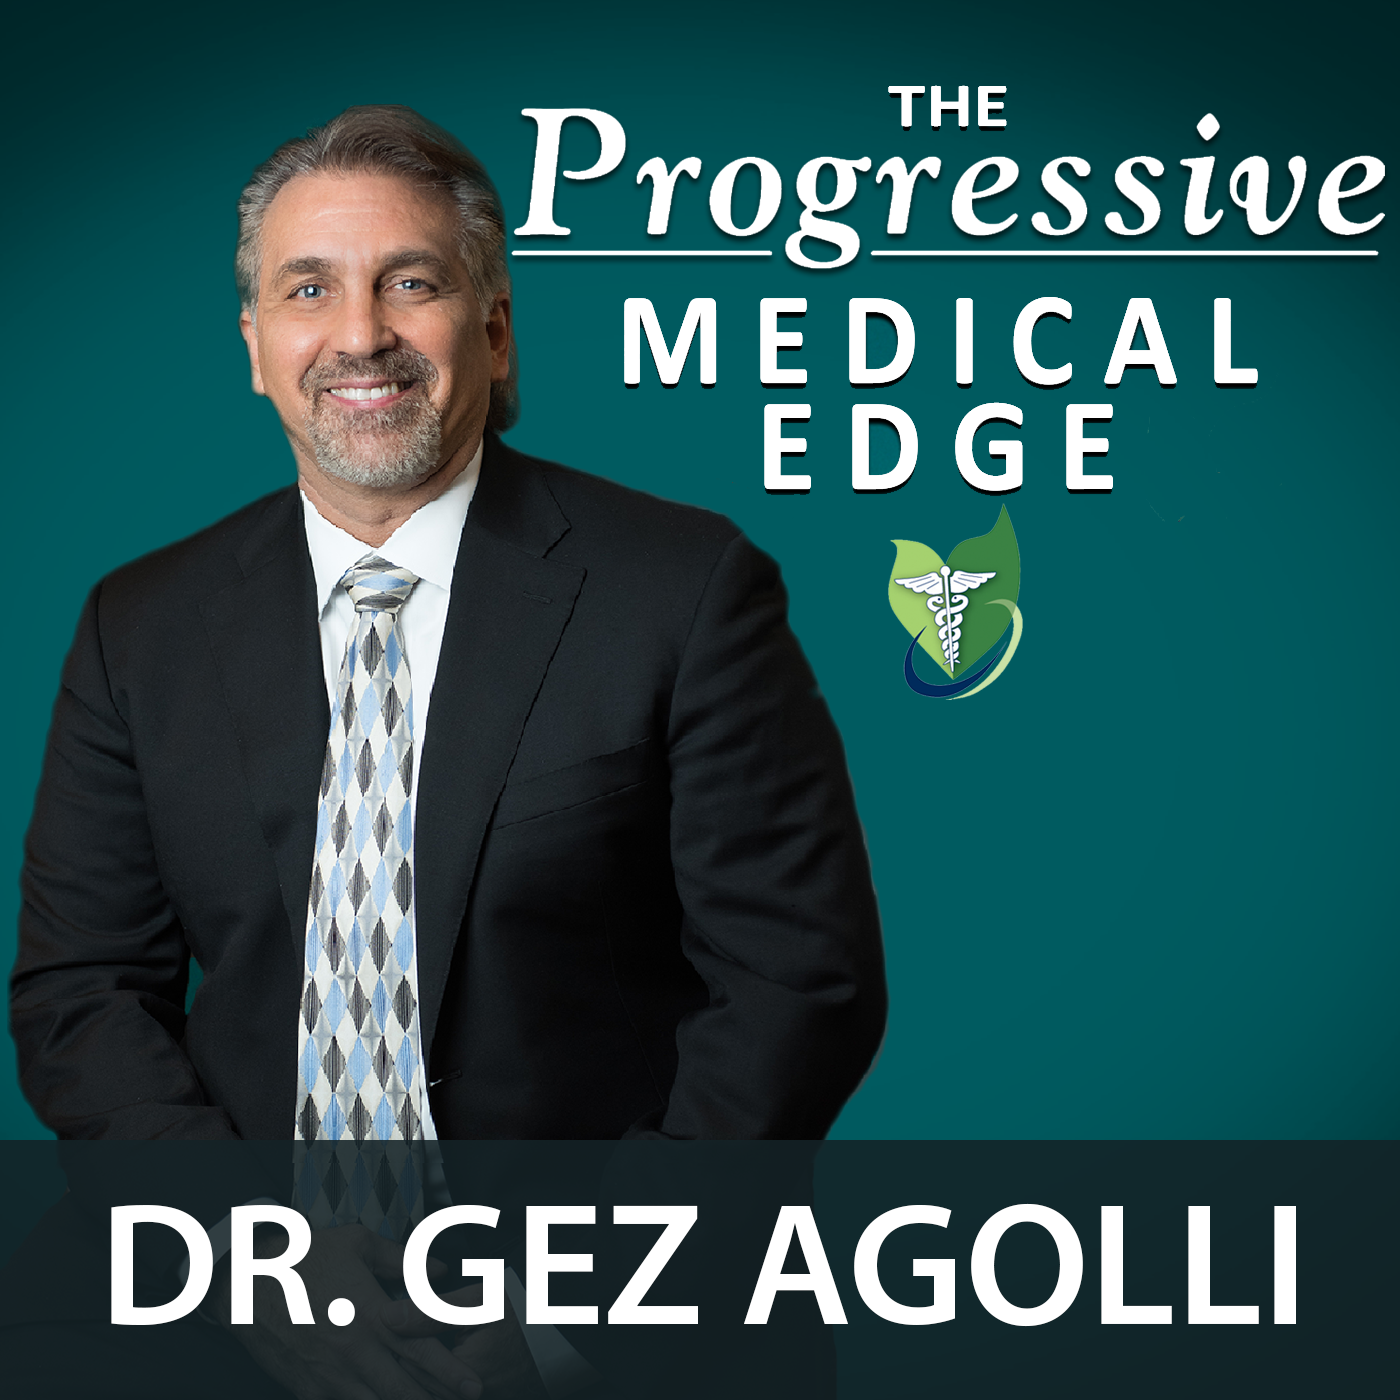 The Progressive Medical Edge with Dr. Gez Agolli show art